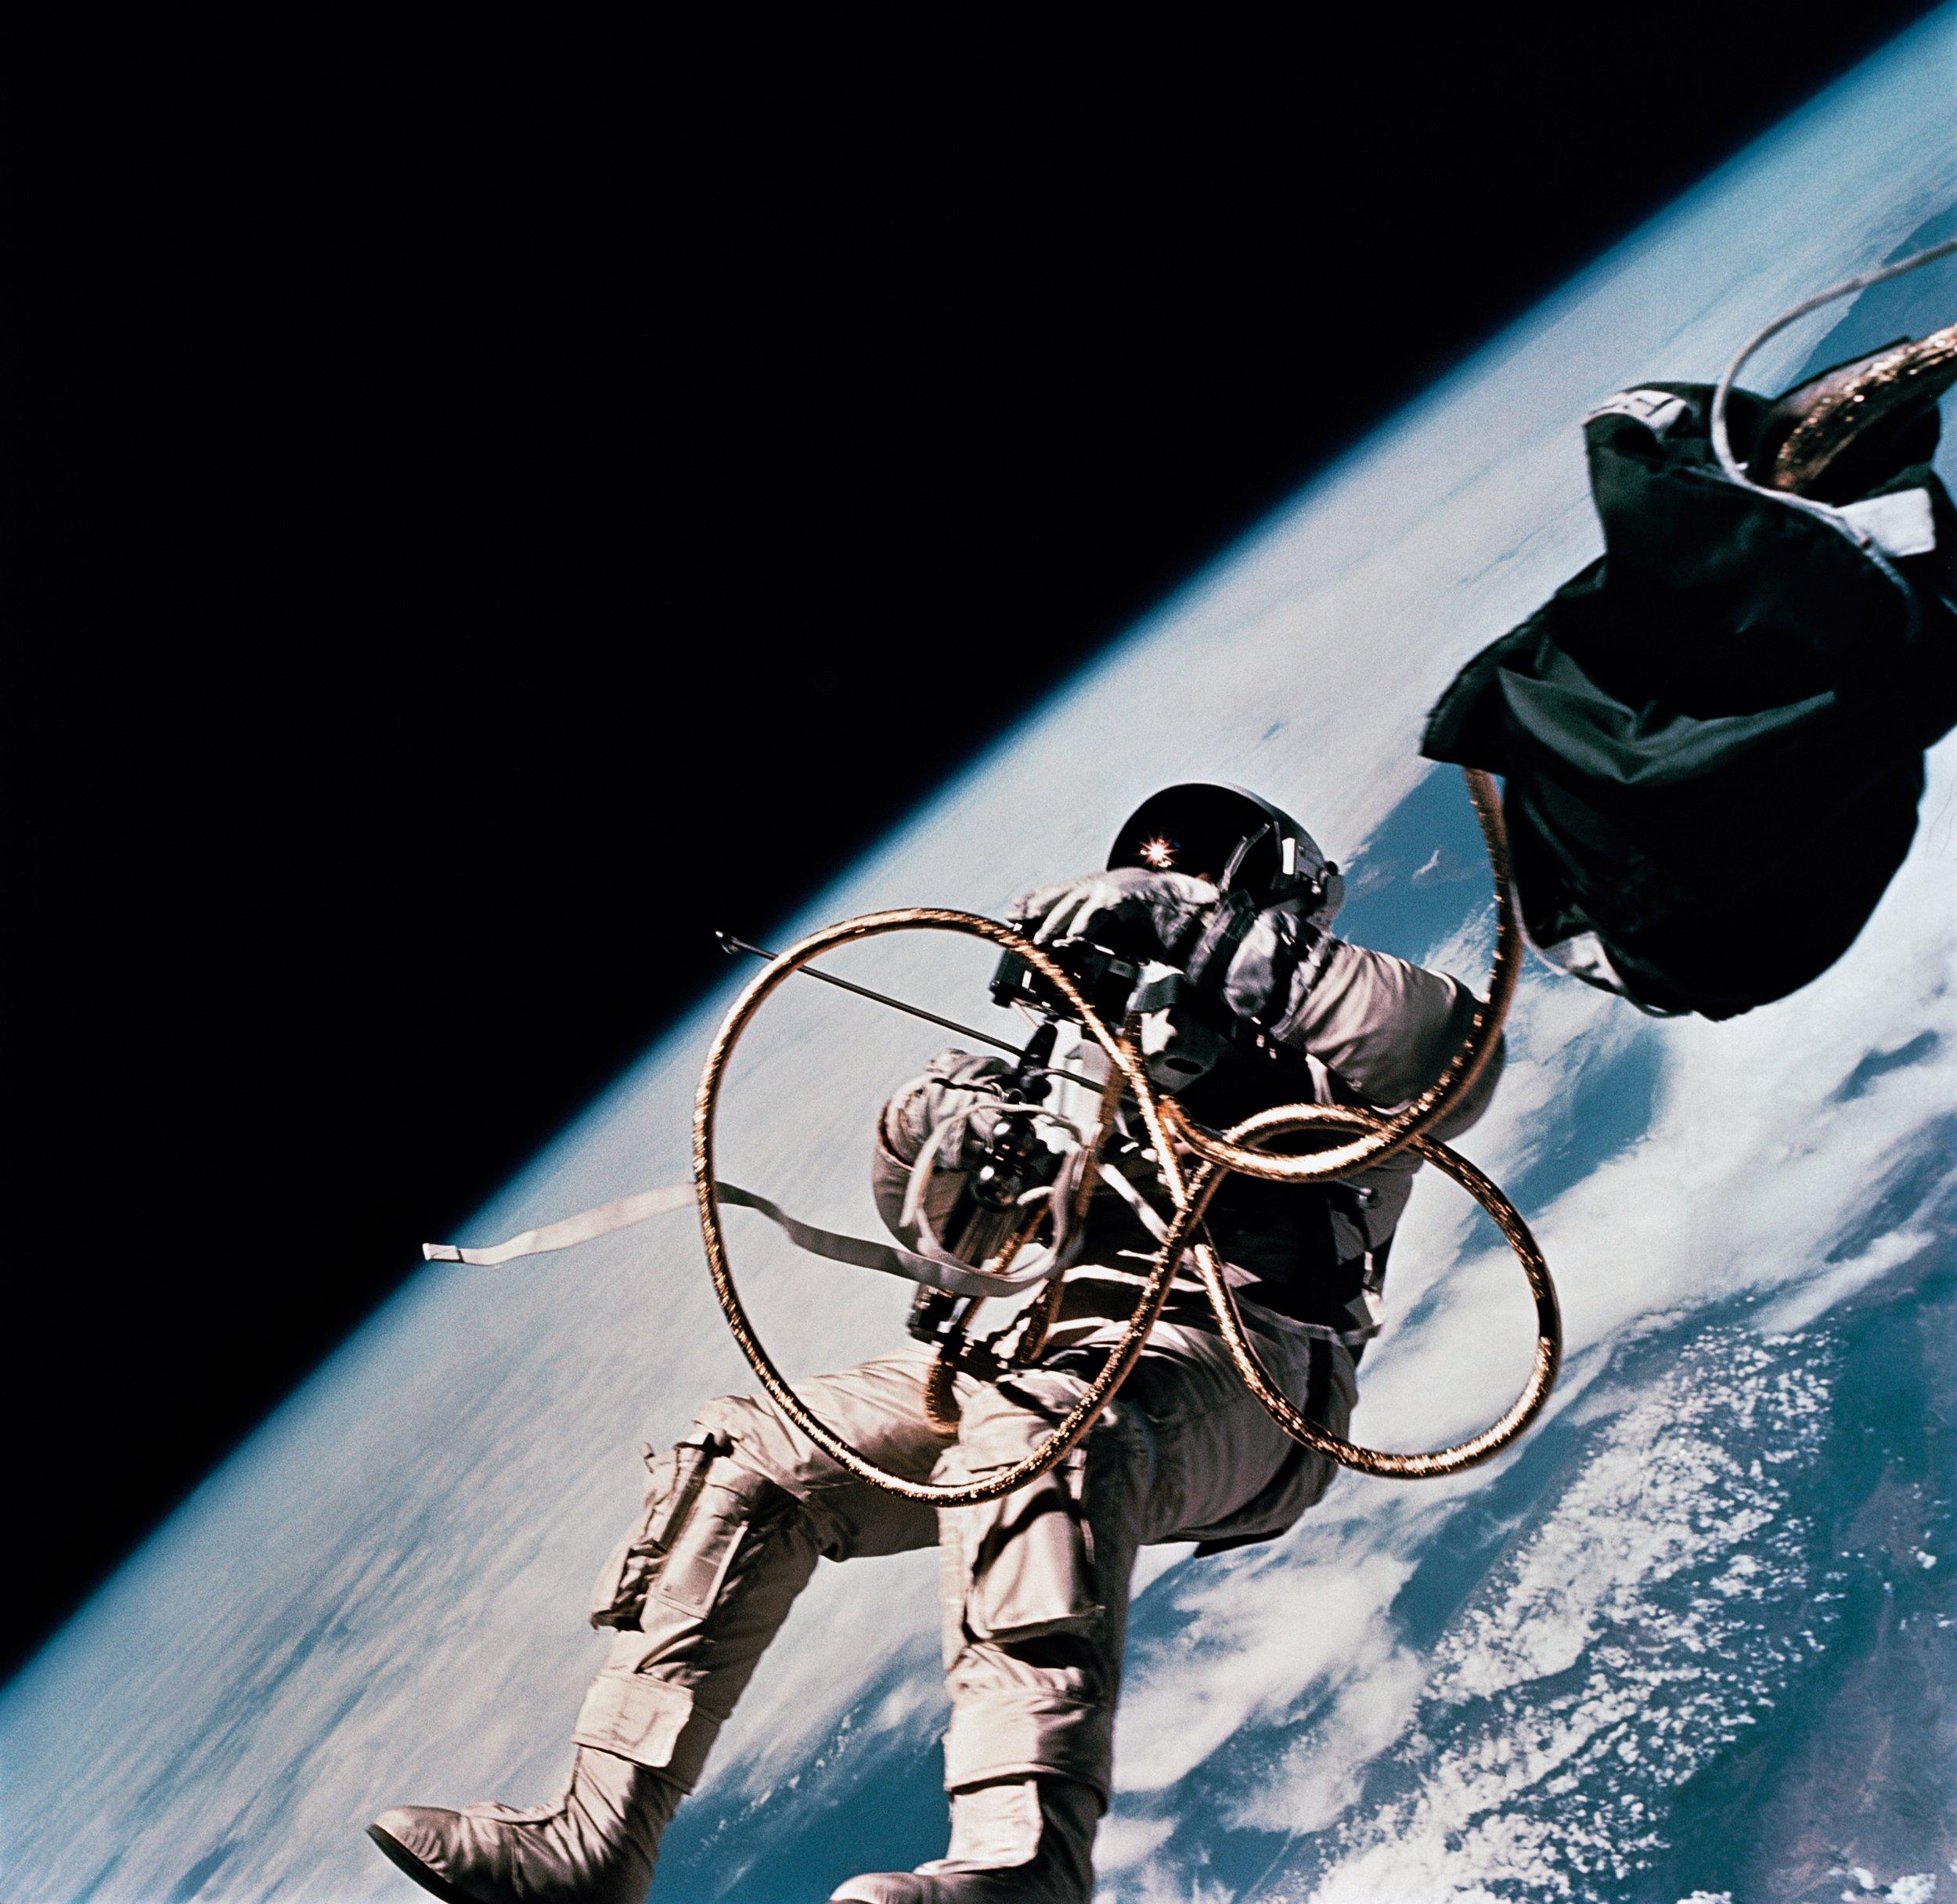 Astronaut Edward H. White II